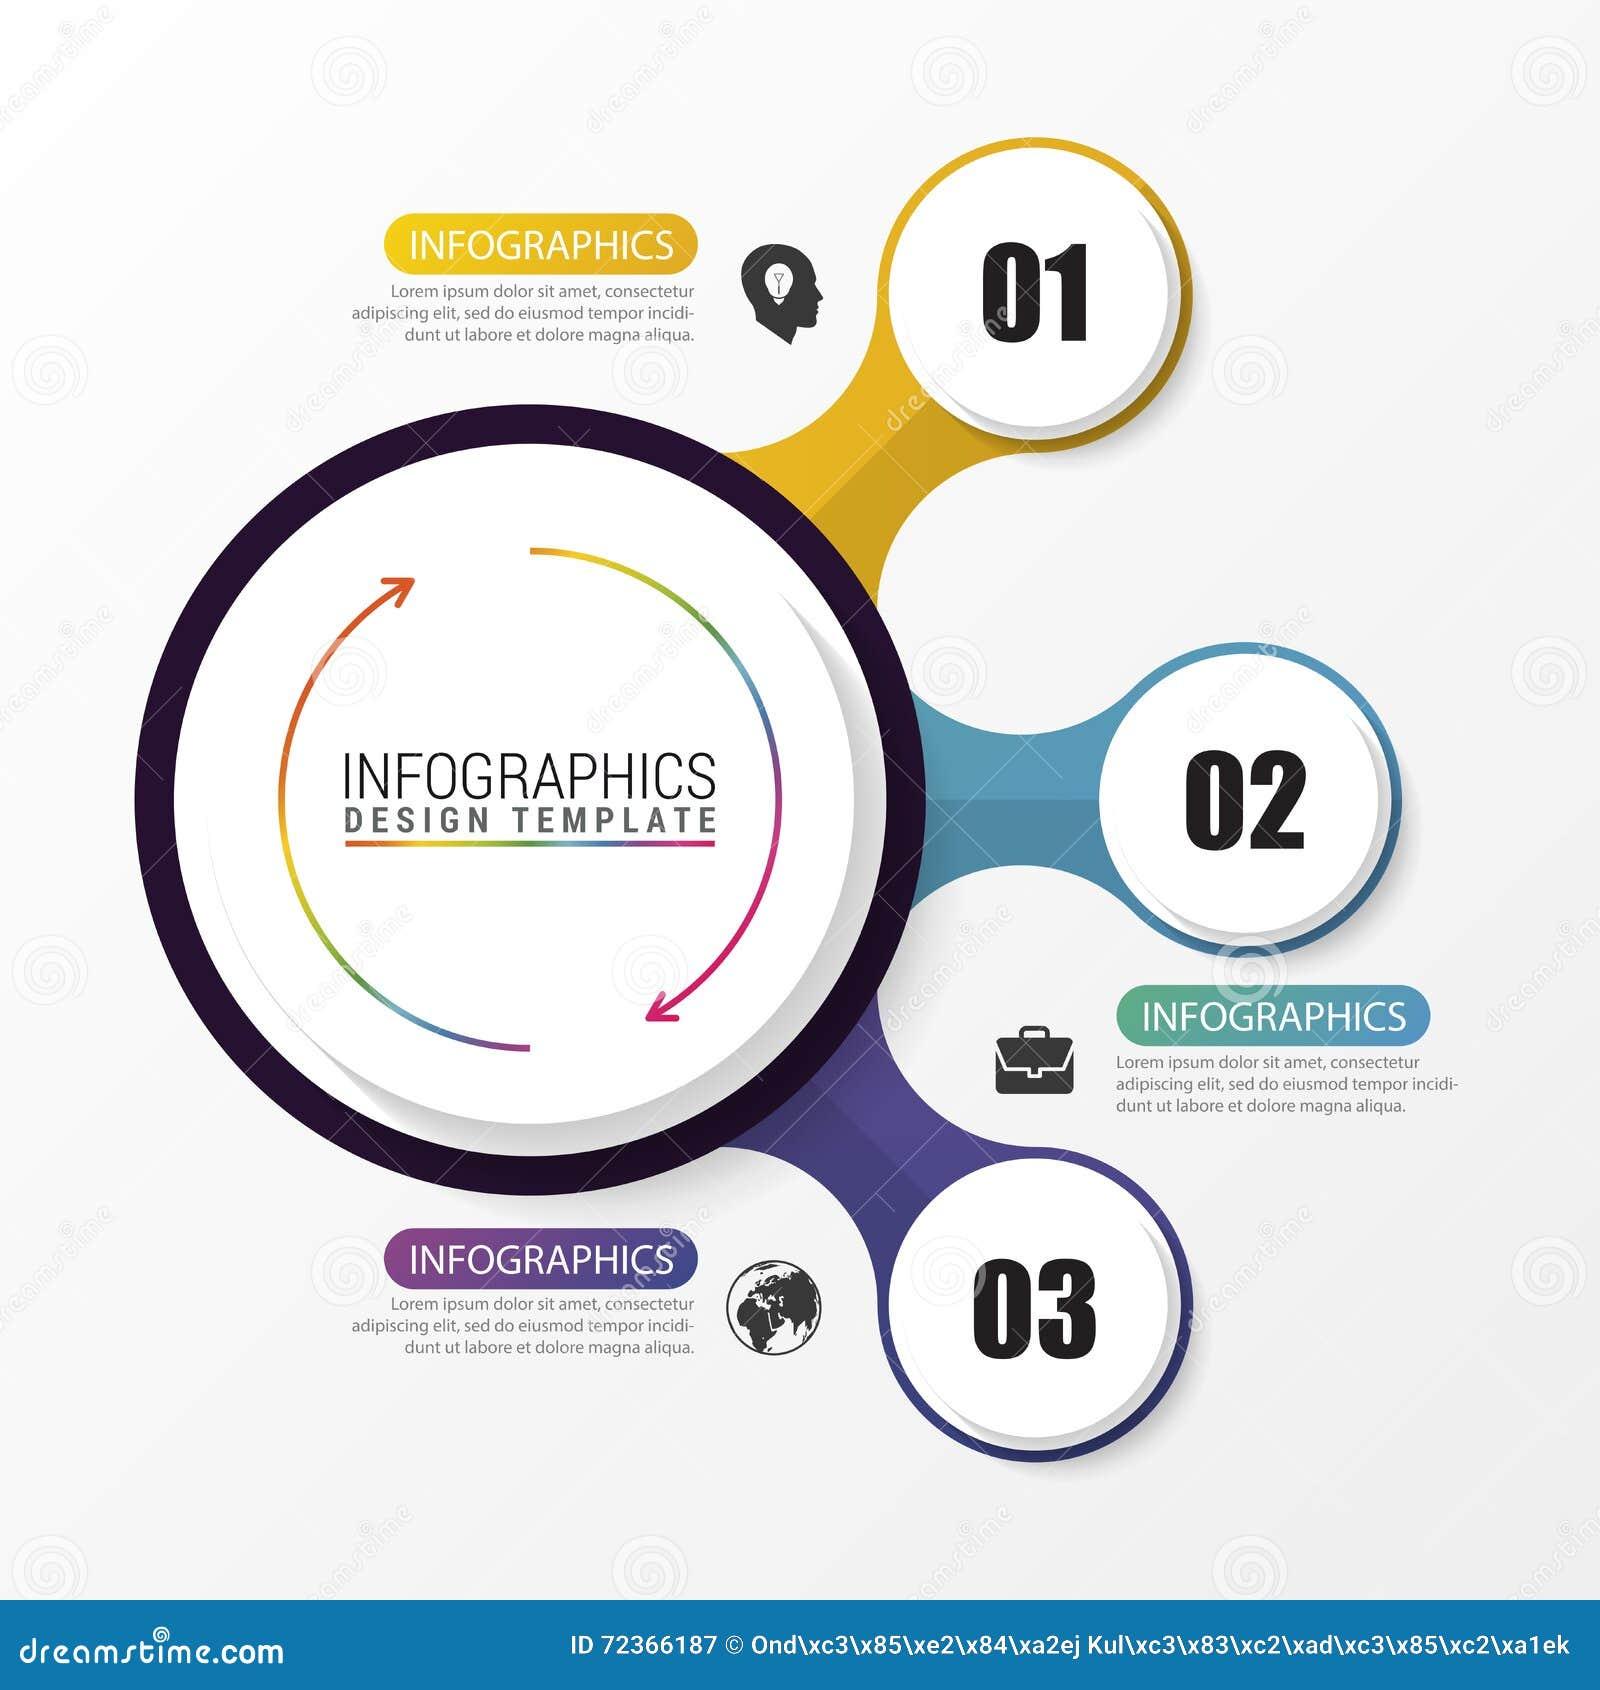 Infographic在灰色背景的设计圈子 向量